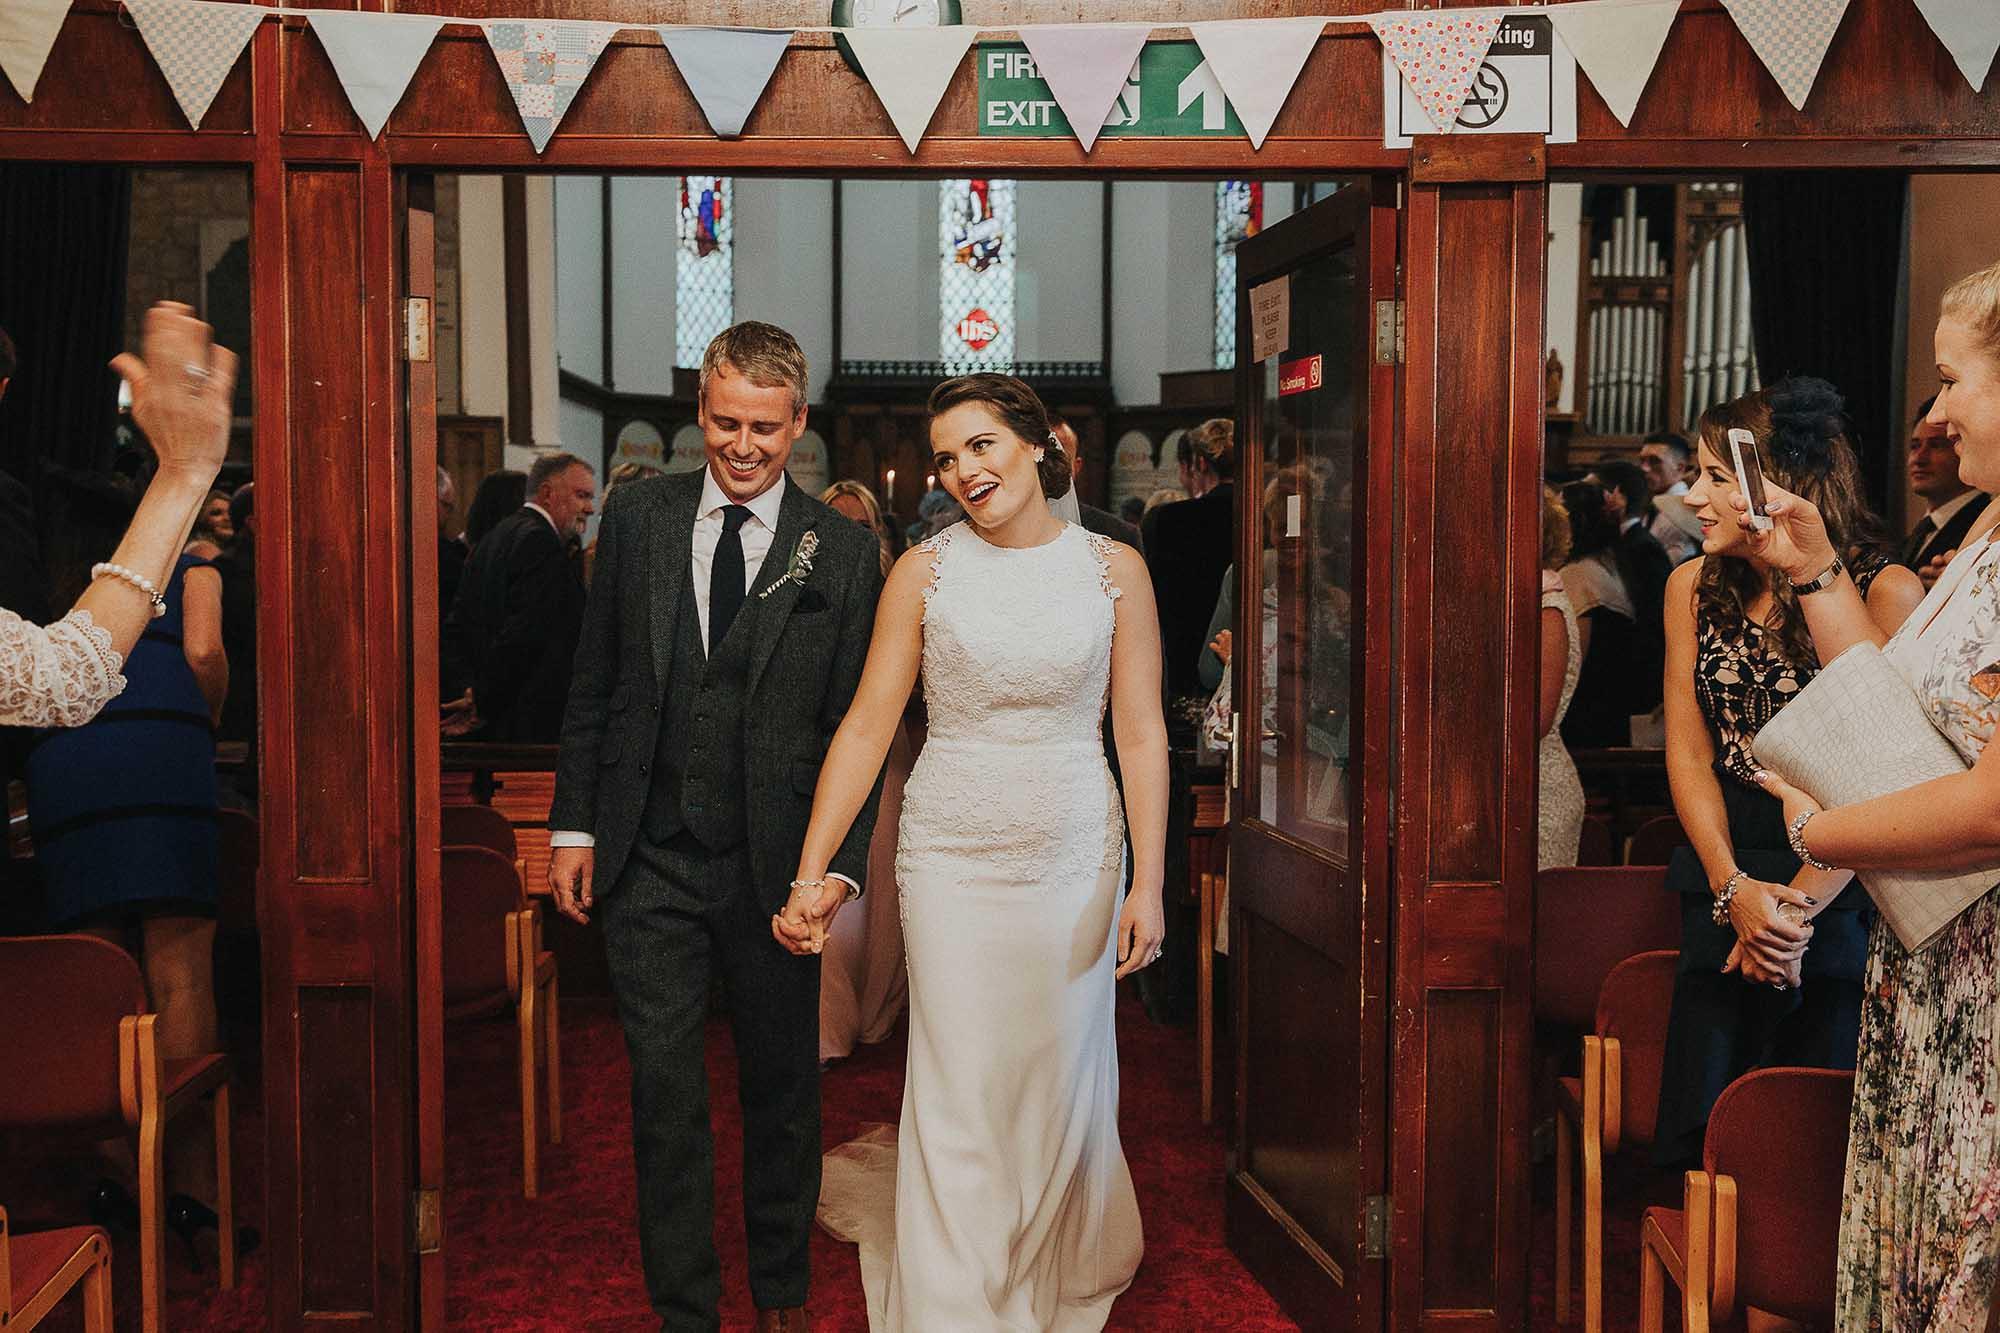 Ripponden church wedding